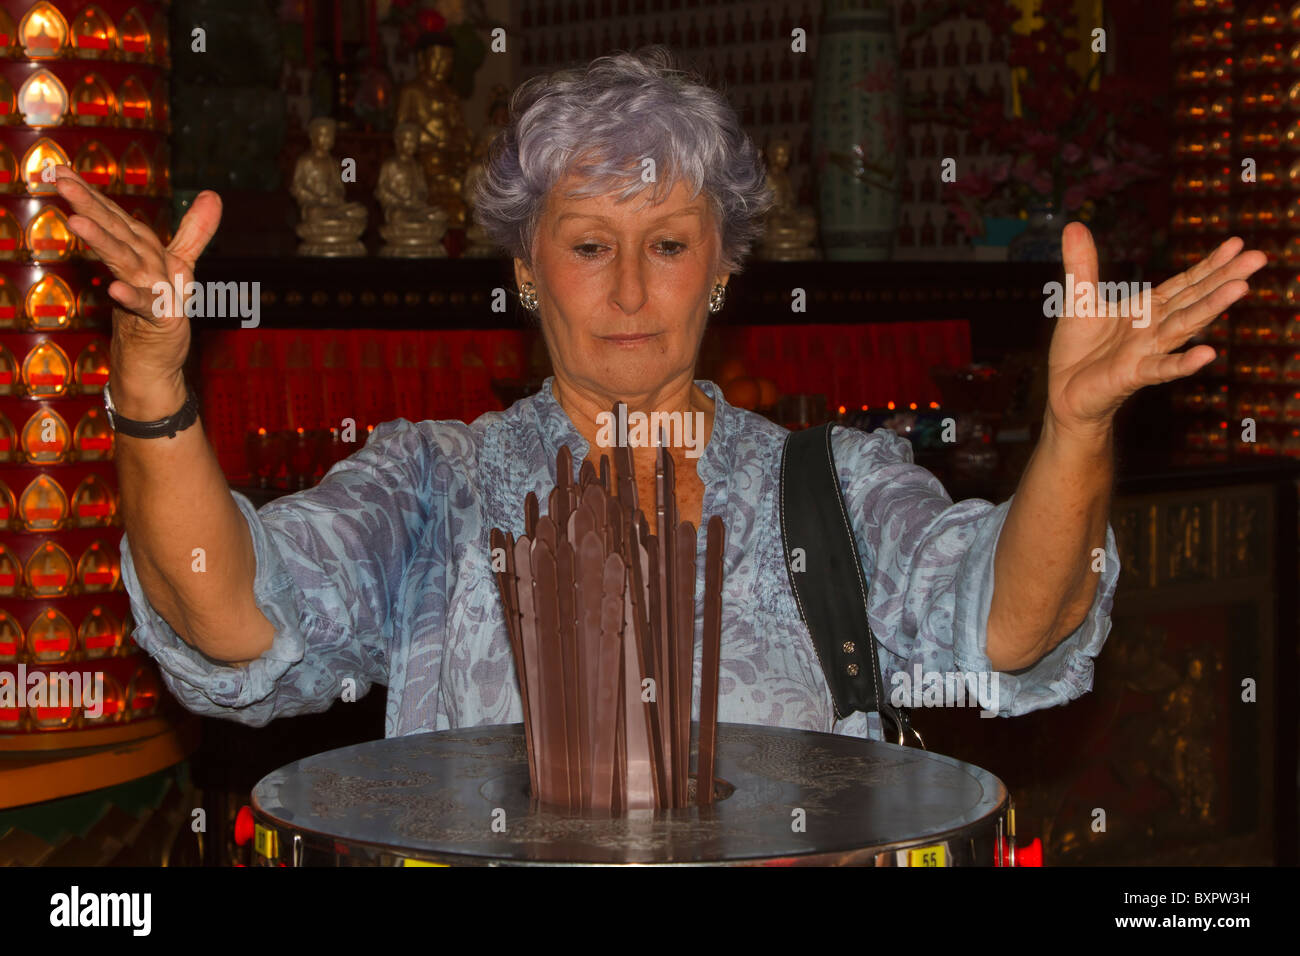 Kau Cim, fortune telling sticks in the Chinese Thean Hou Temple, Kuala Lumpur, Malaysia. - Stock Image